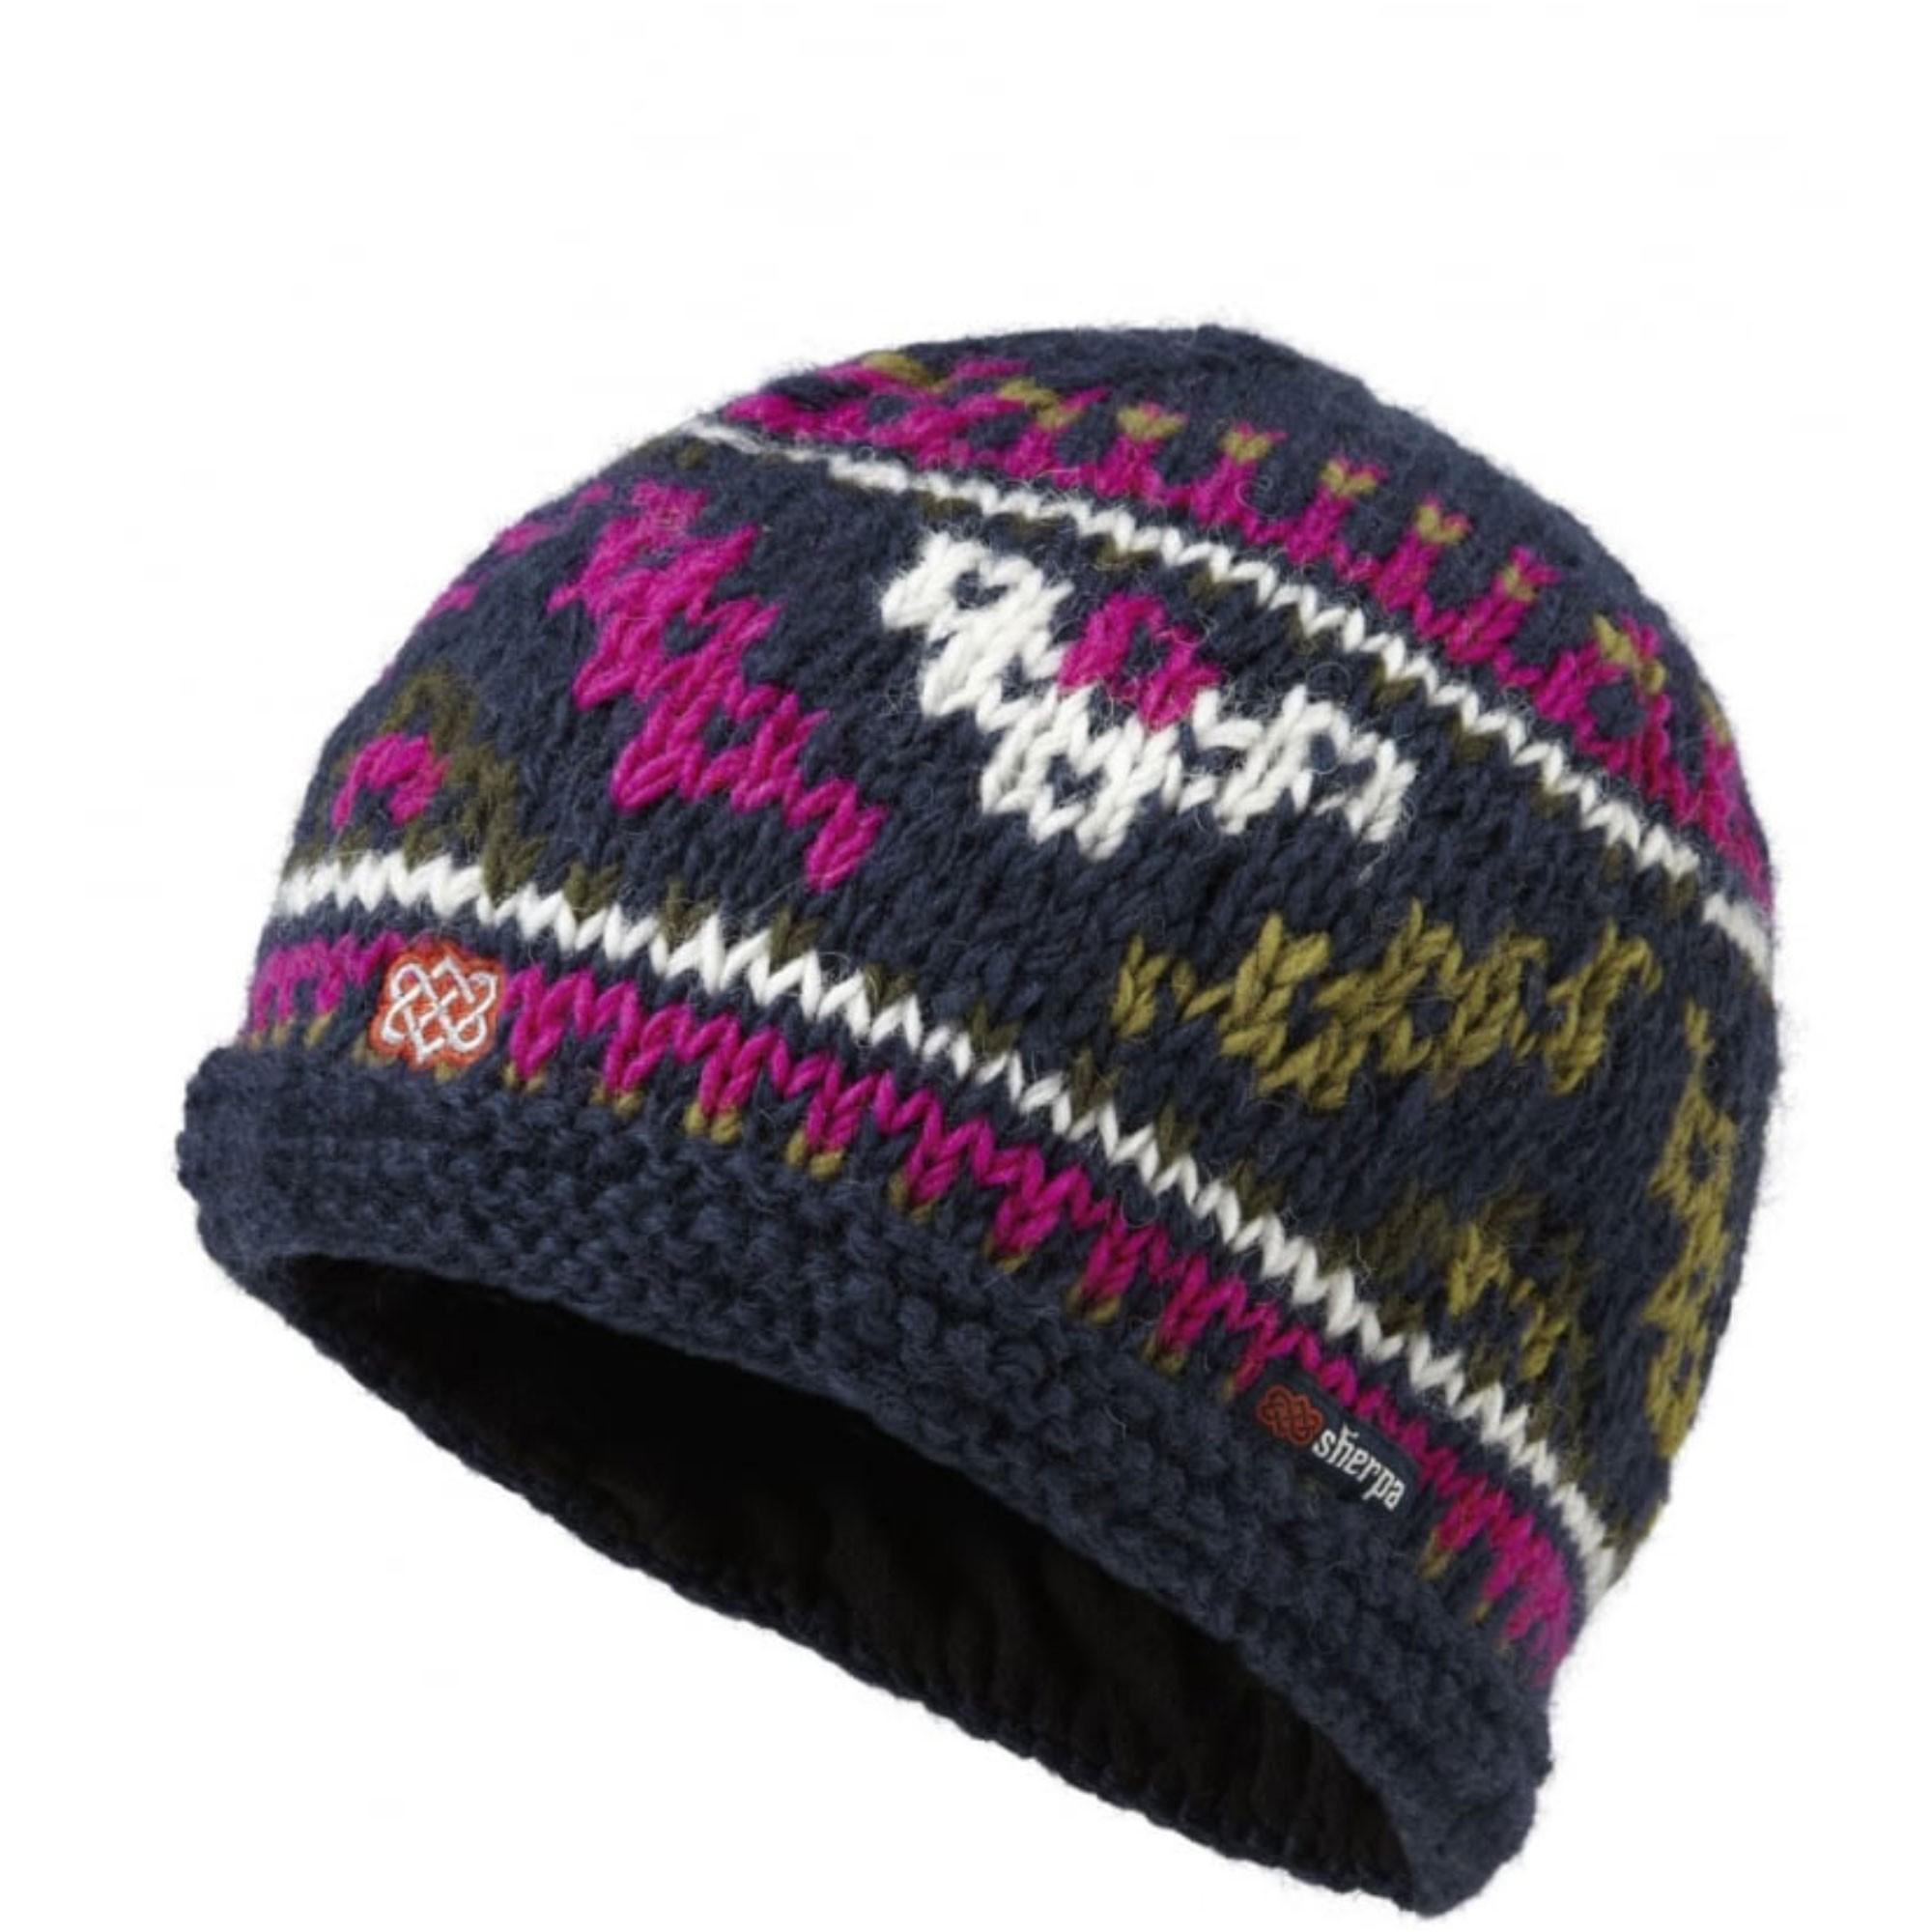 SHERPA - Pema Lambswool Hat